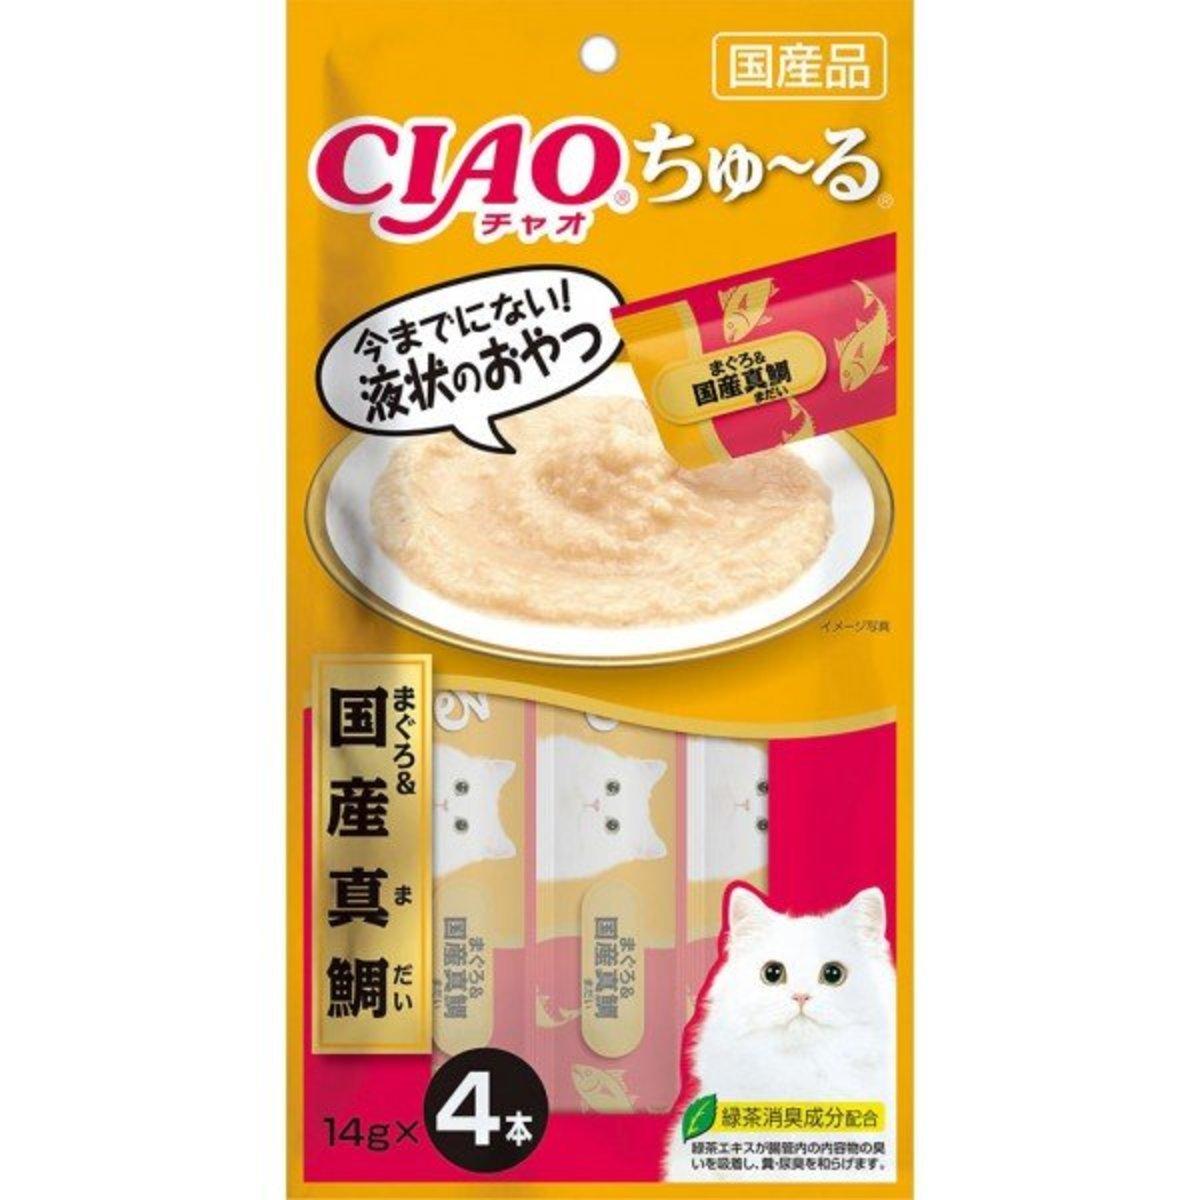 CIAO Churu Tuna and Red Snapper Puree (14g x 4) #SC-177